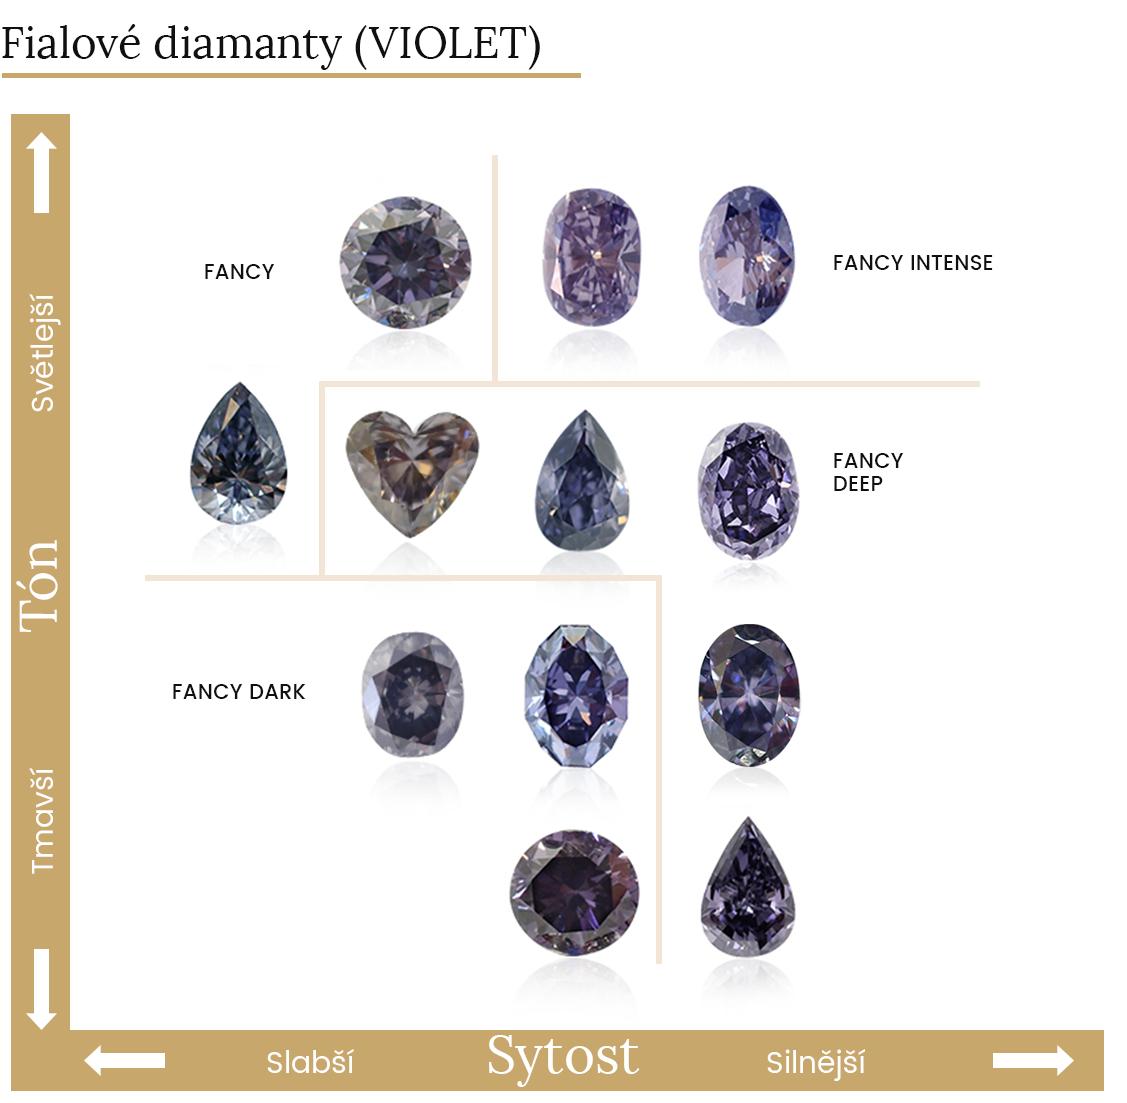 barvy fialových diamantů